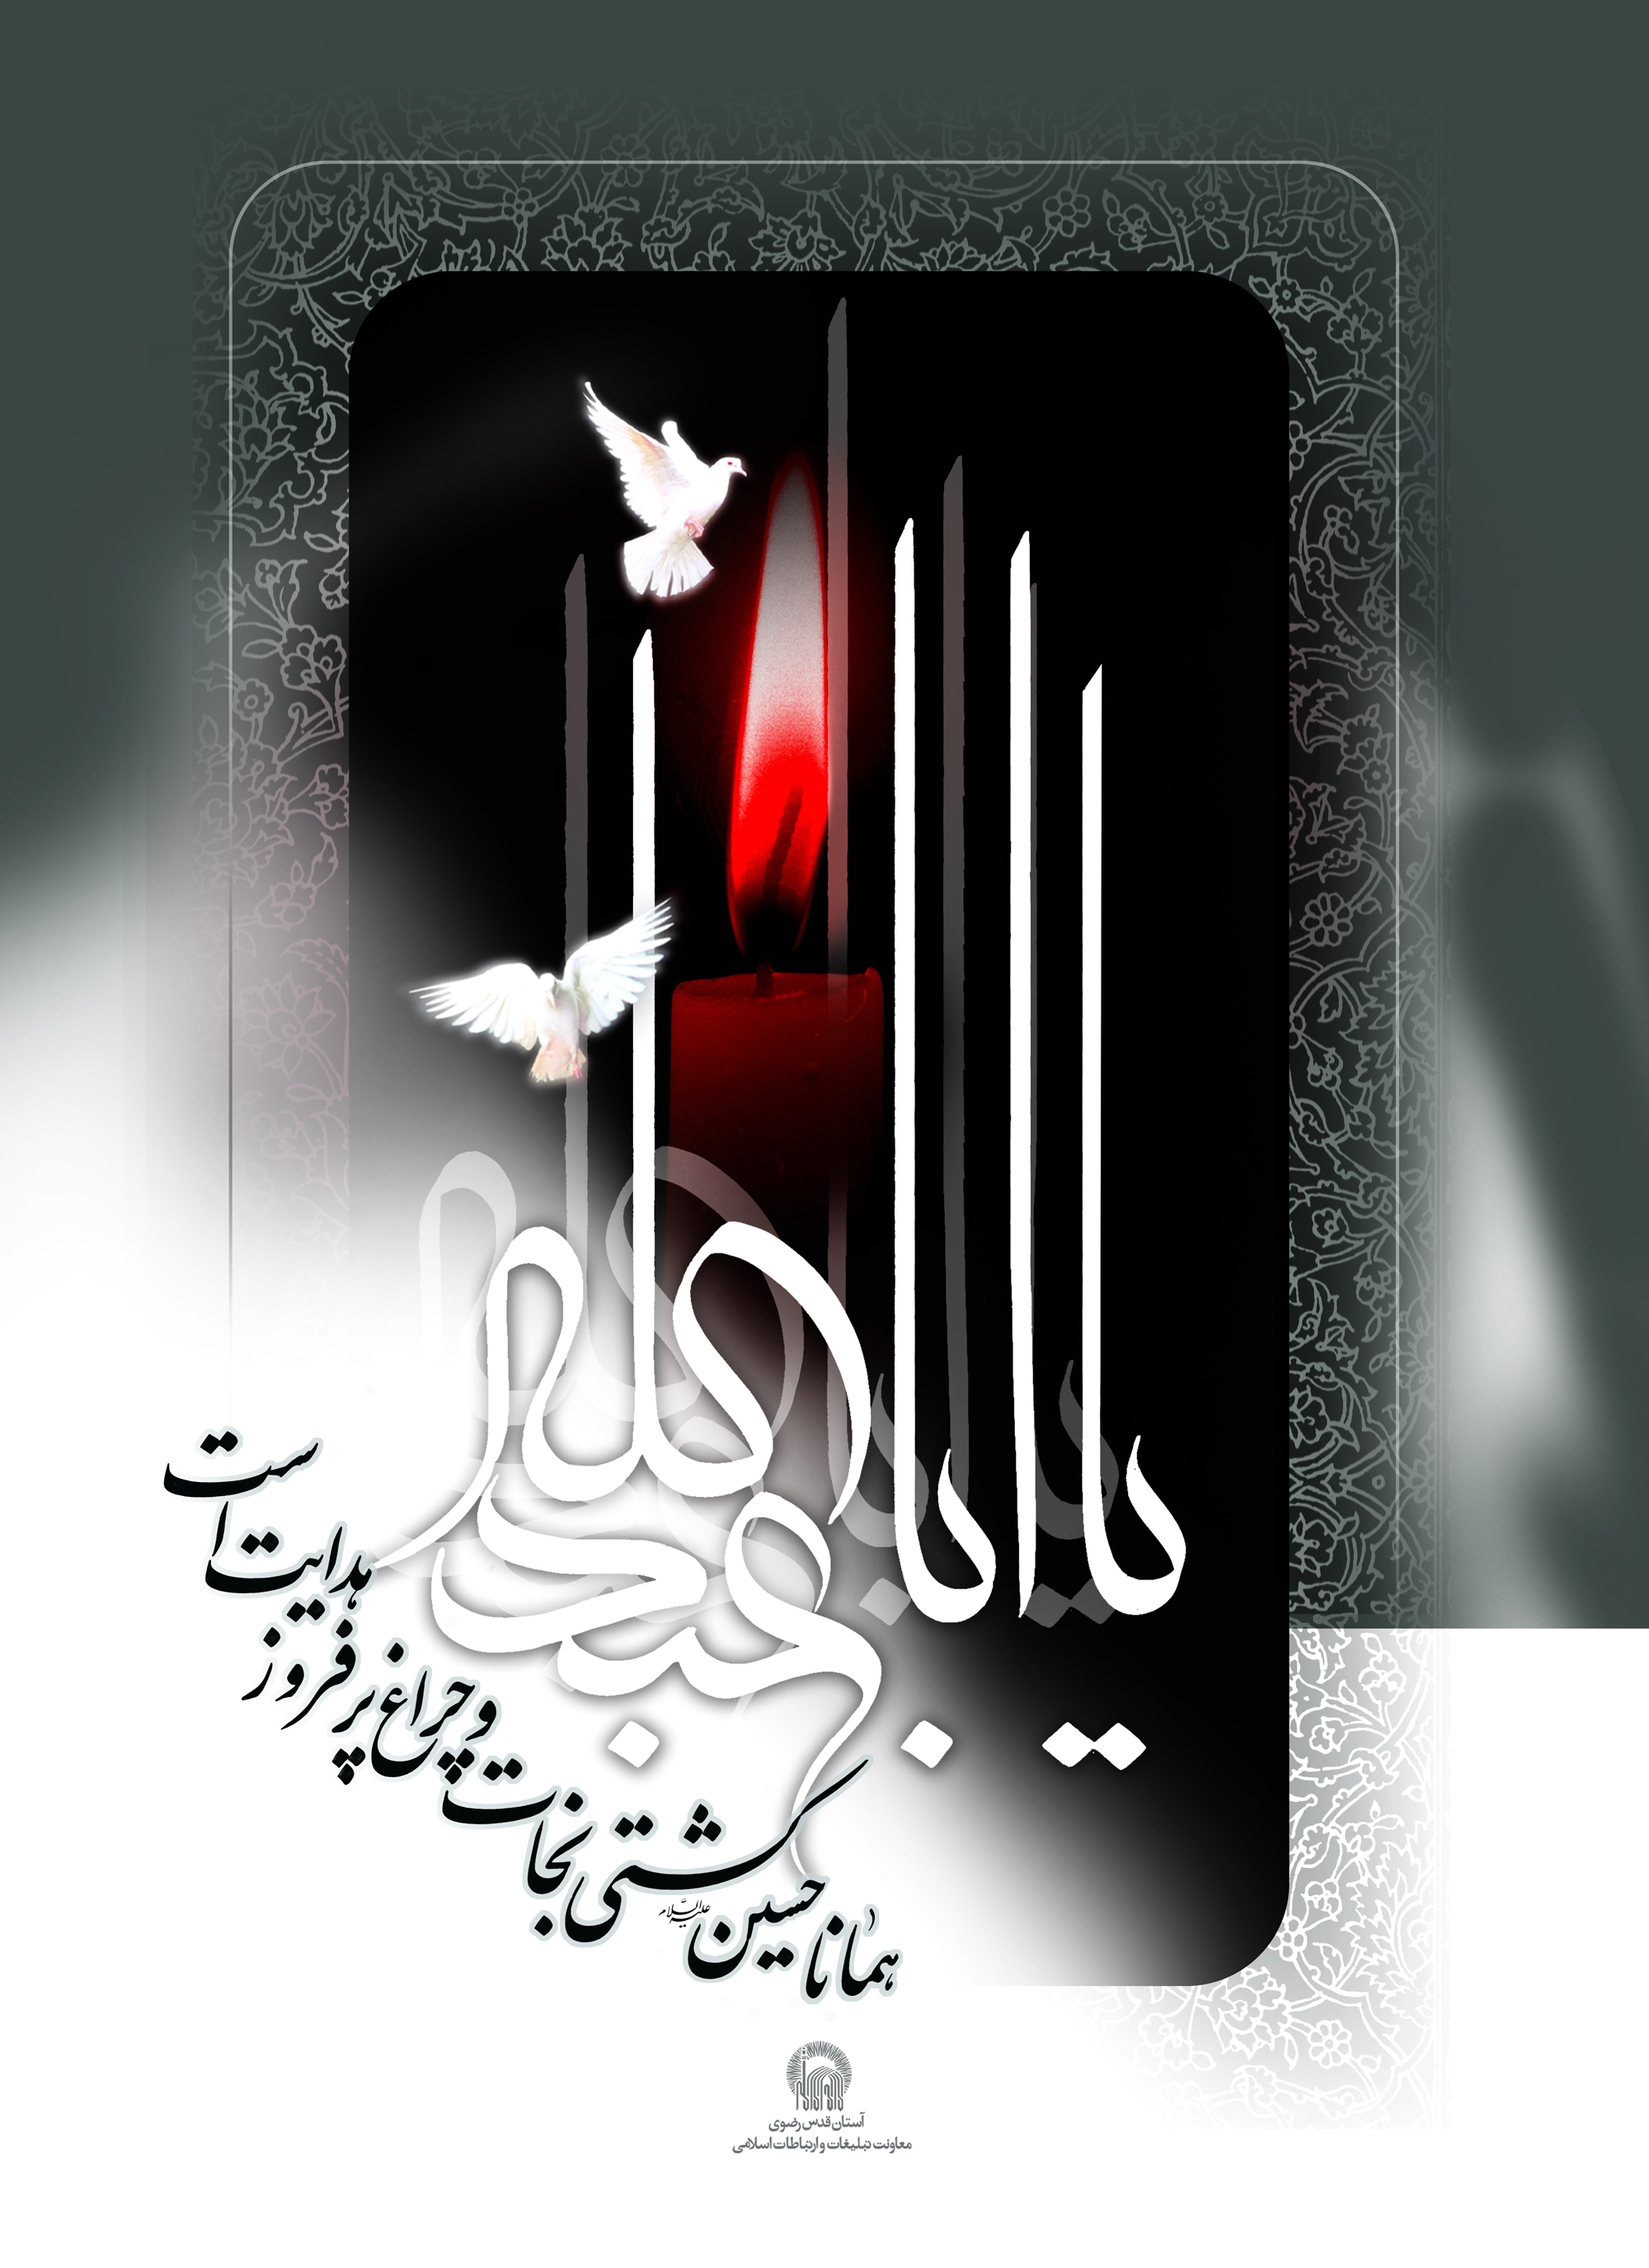 ۰۱۰_ImamHussein_www.IslamicWallpaper